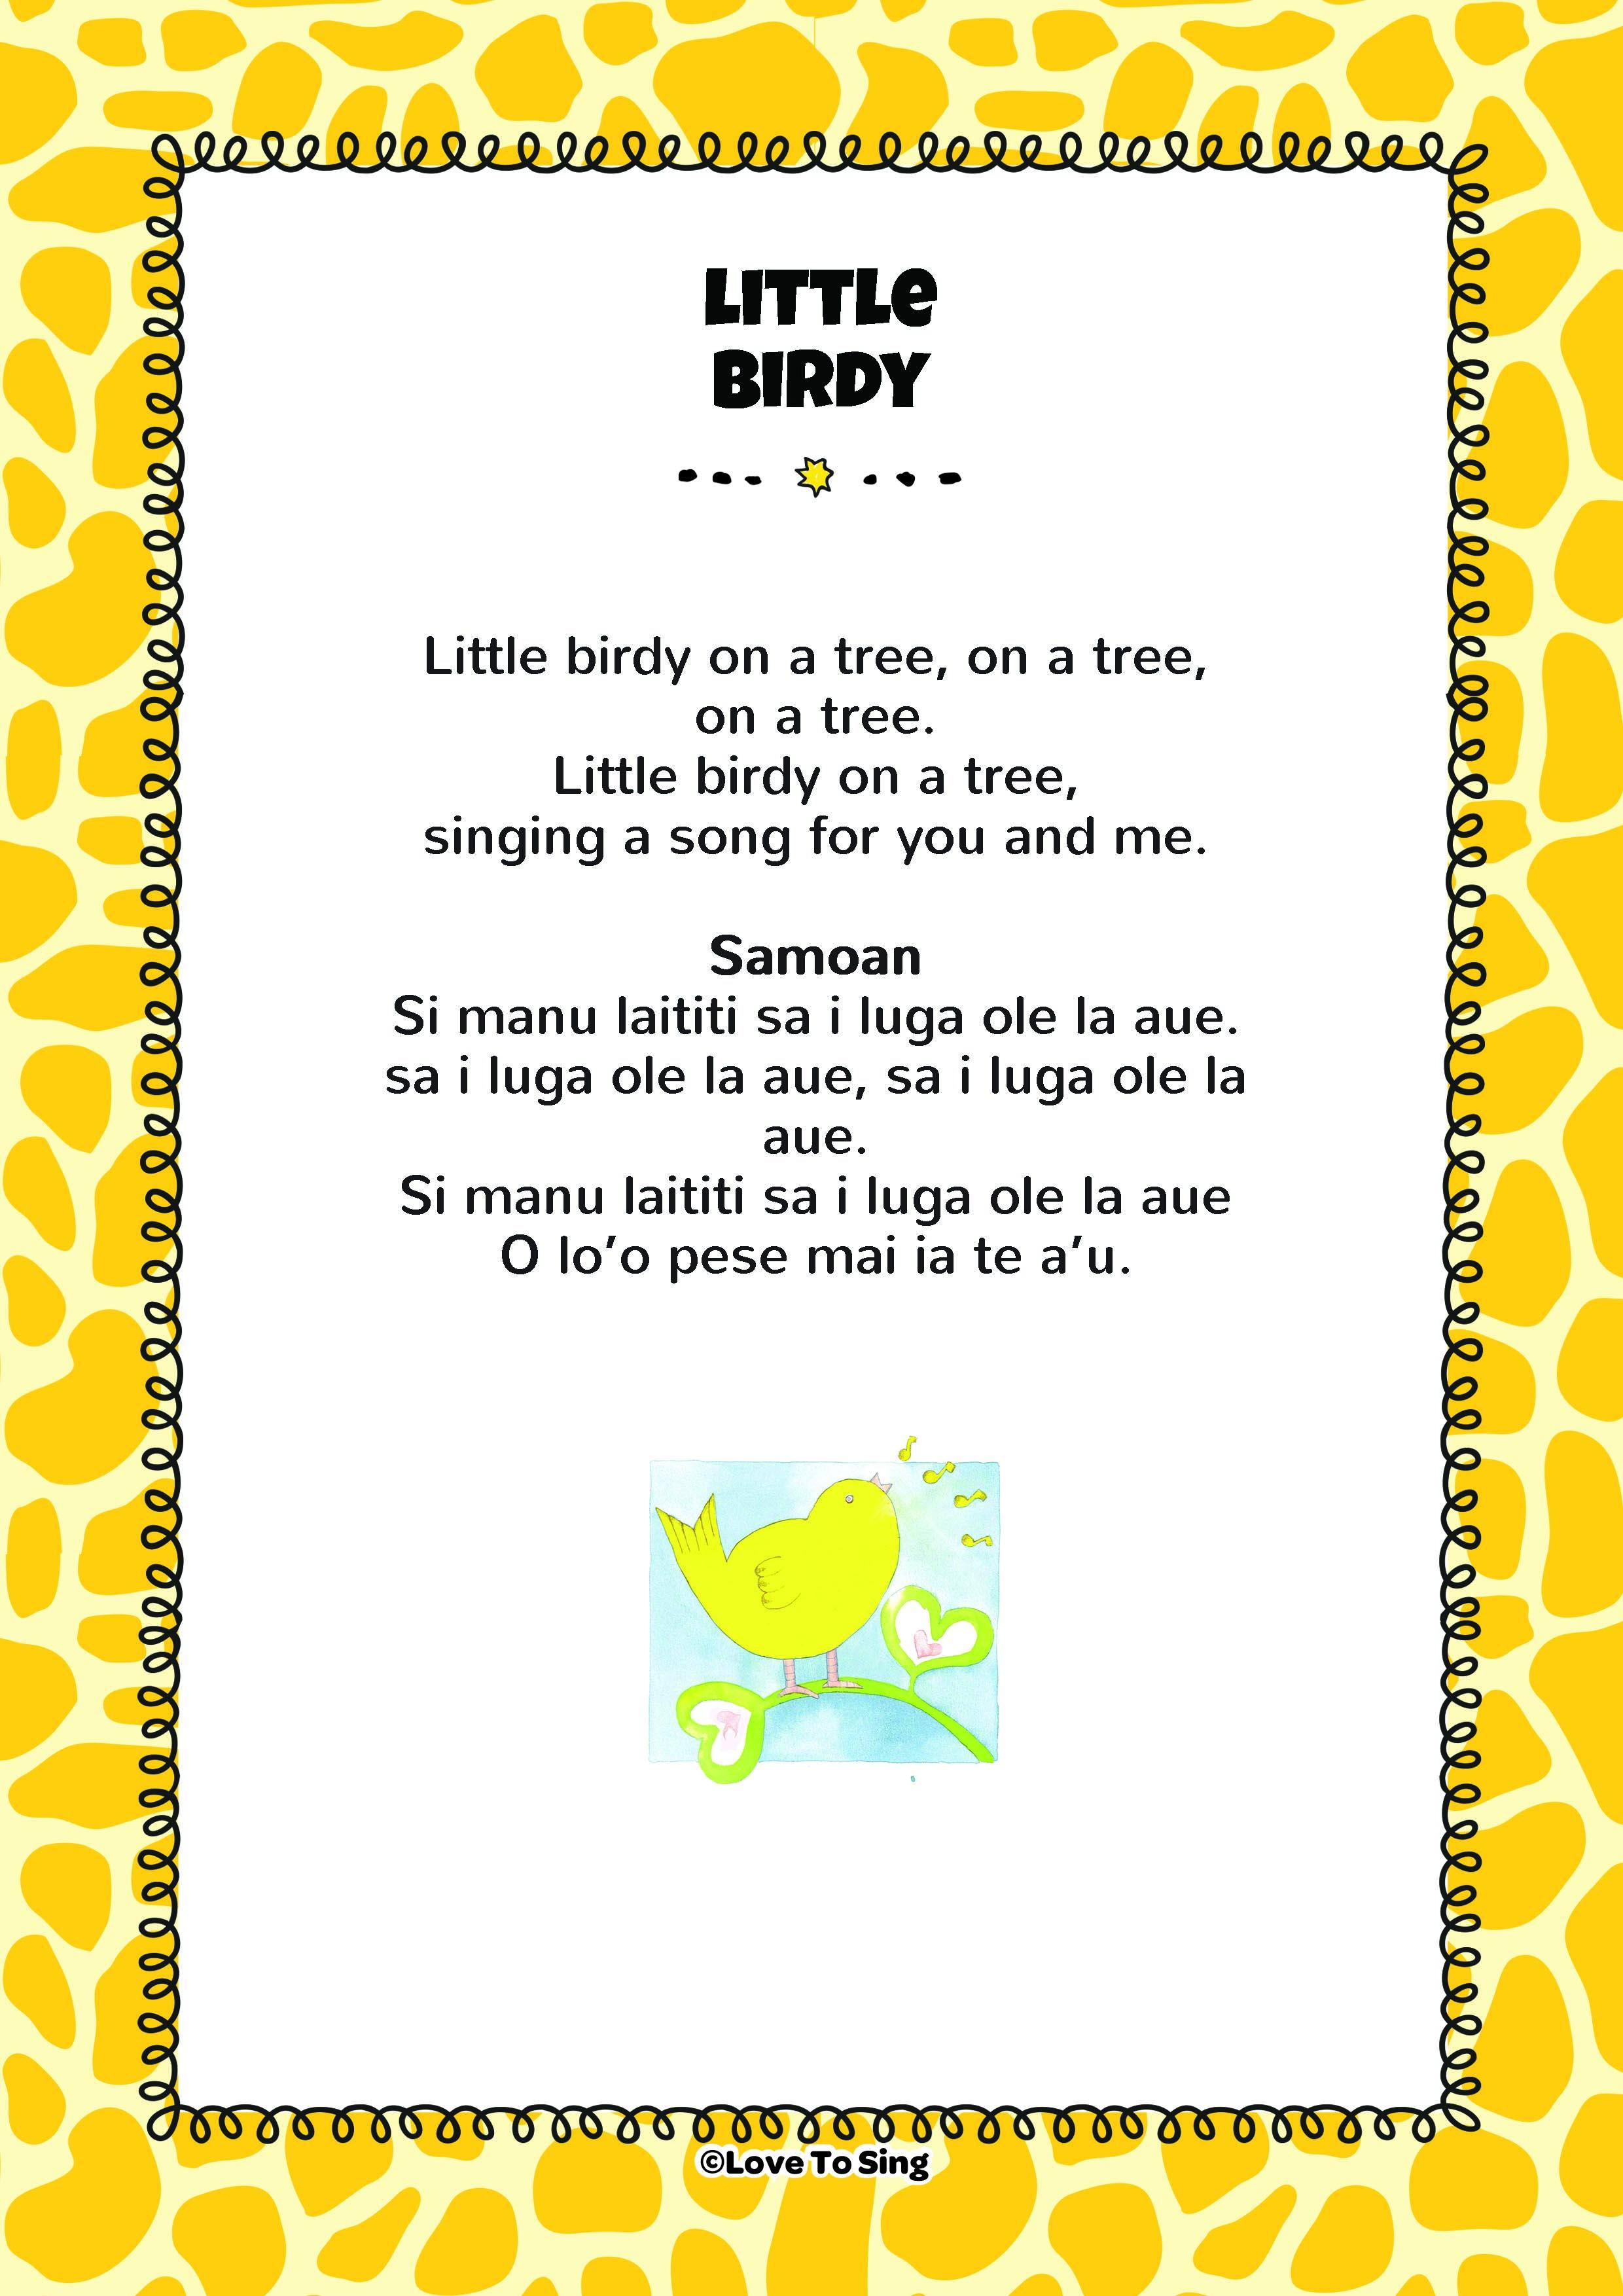 Little Birdy on a Tree | English & Samoan | FREE Video & Lyrics